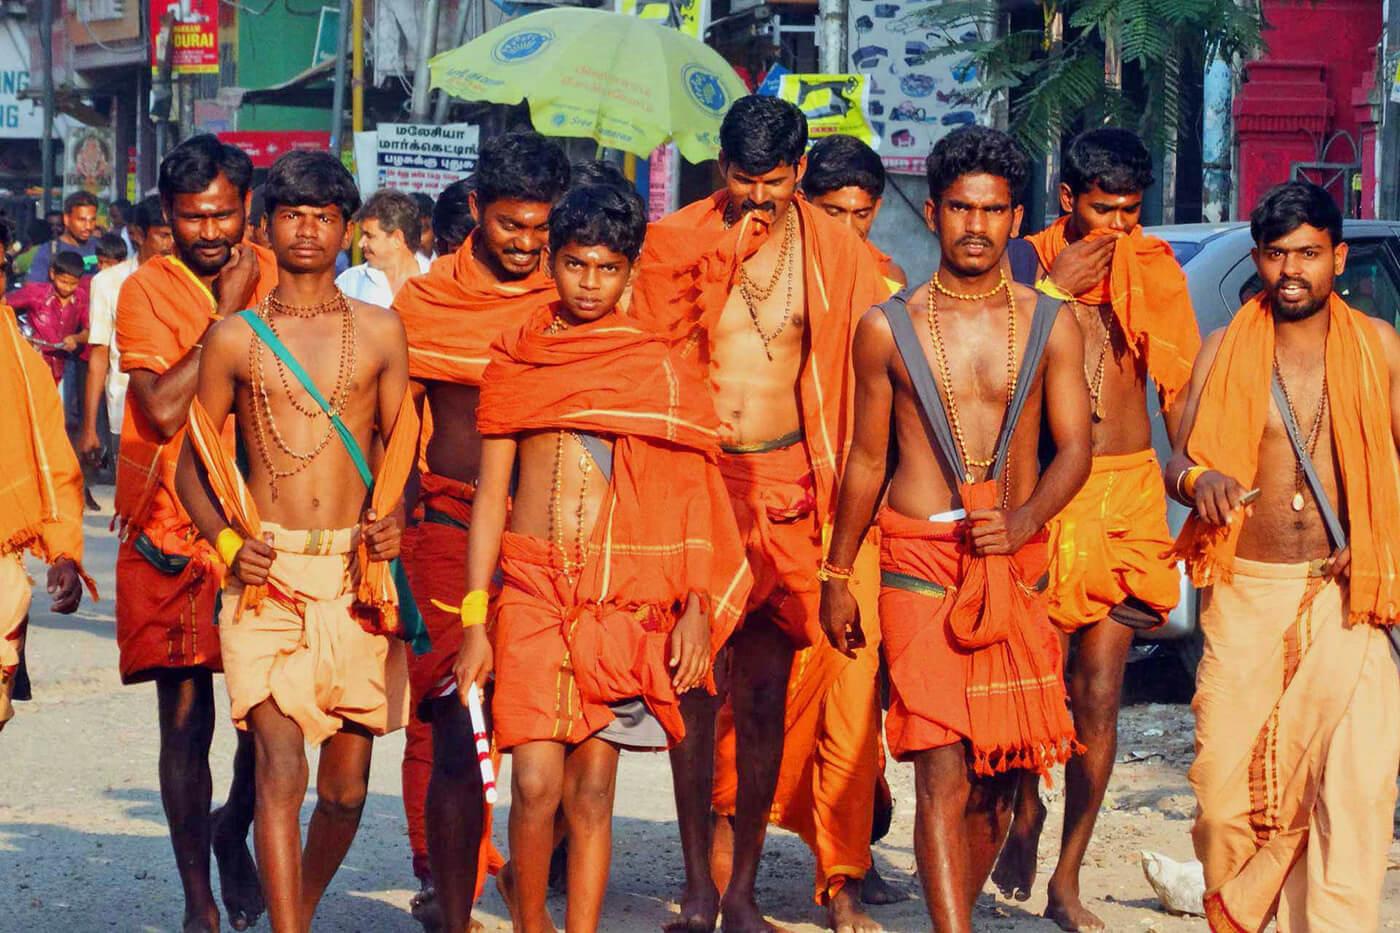 Gruppe junger Männer in Swami-Kleidung.